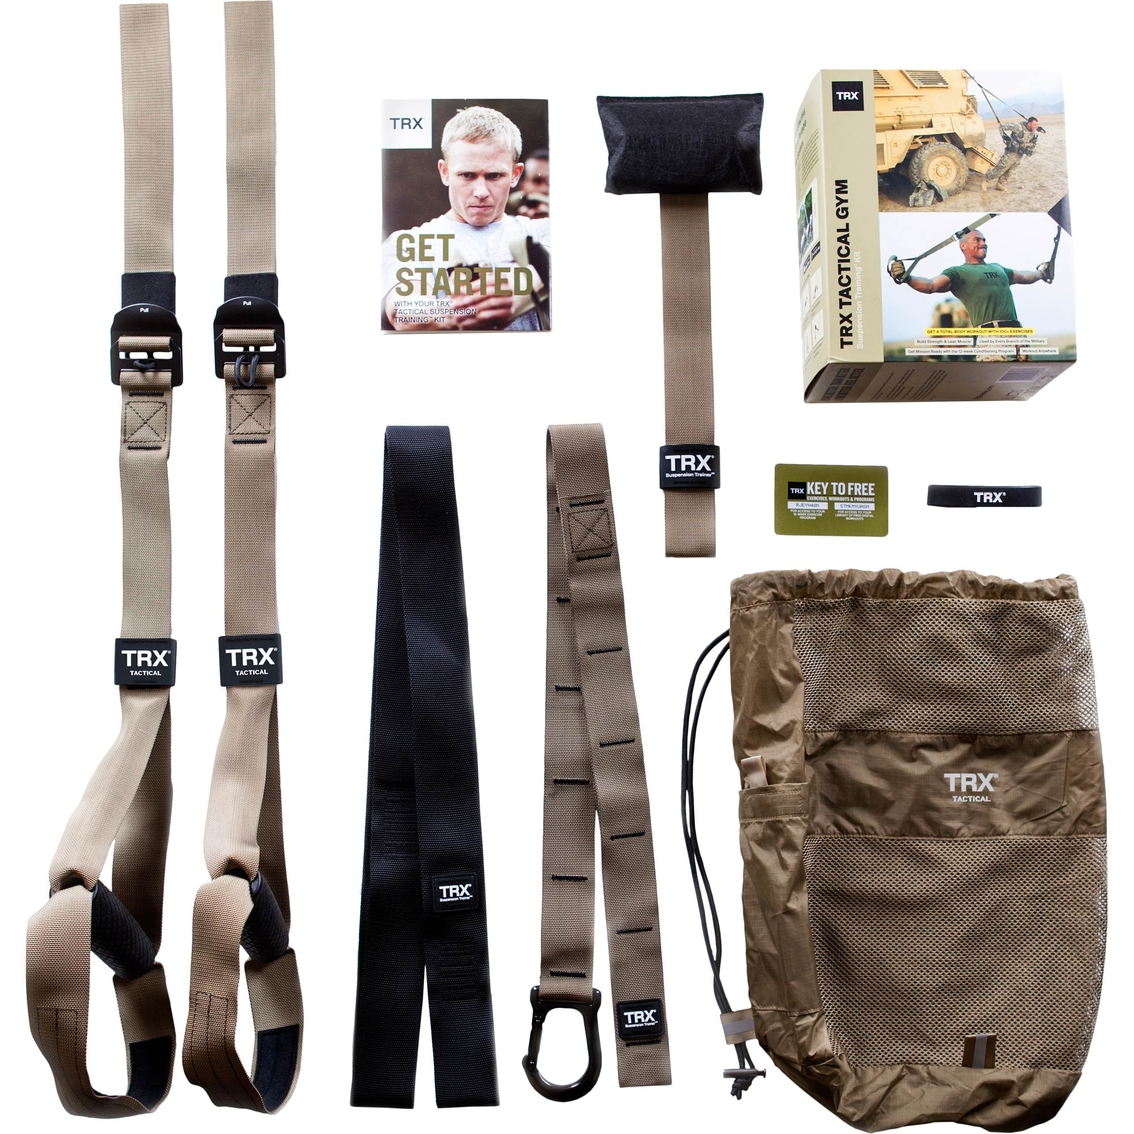 TRX Tactical Gym Kit